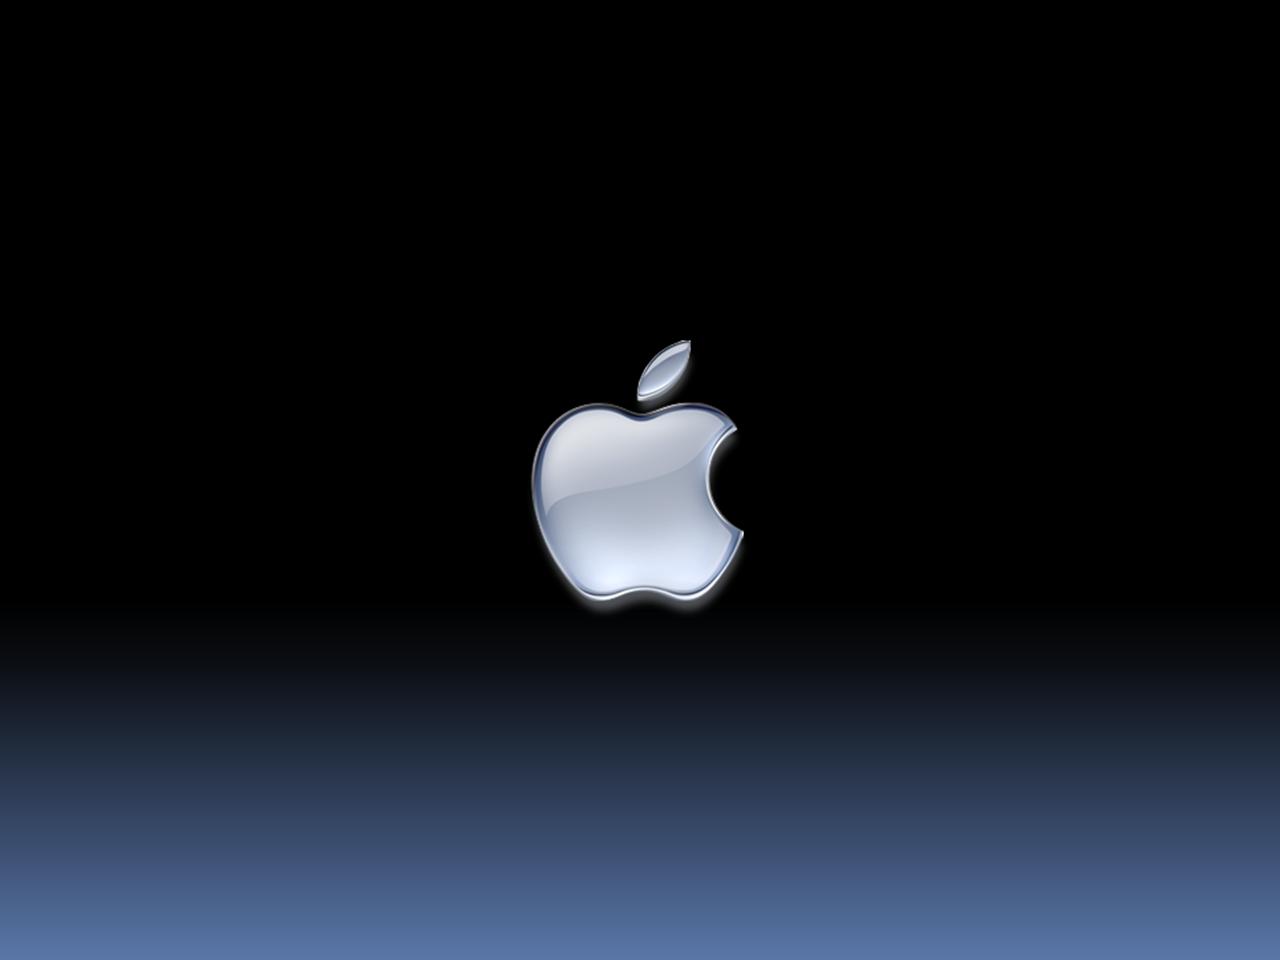 apple - photo #44